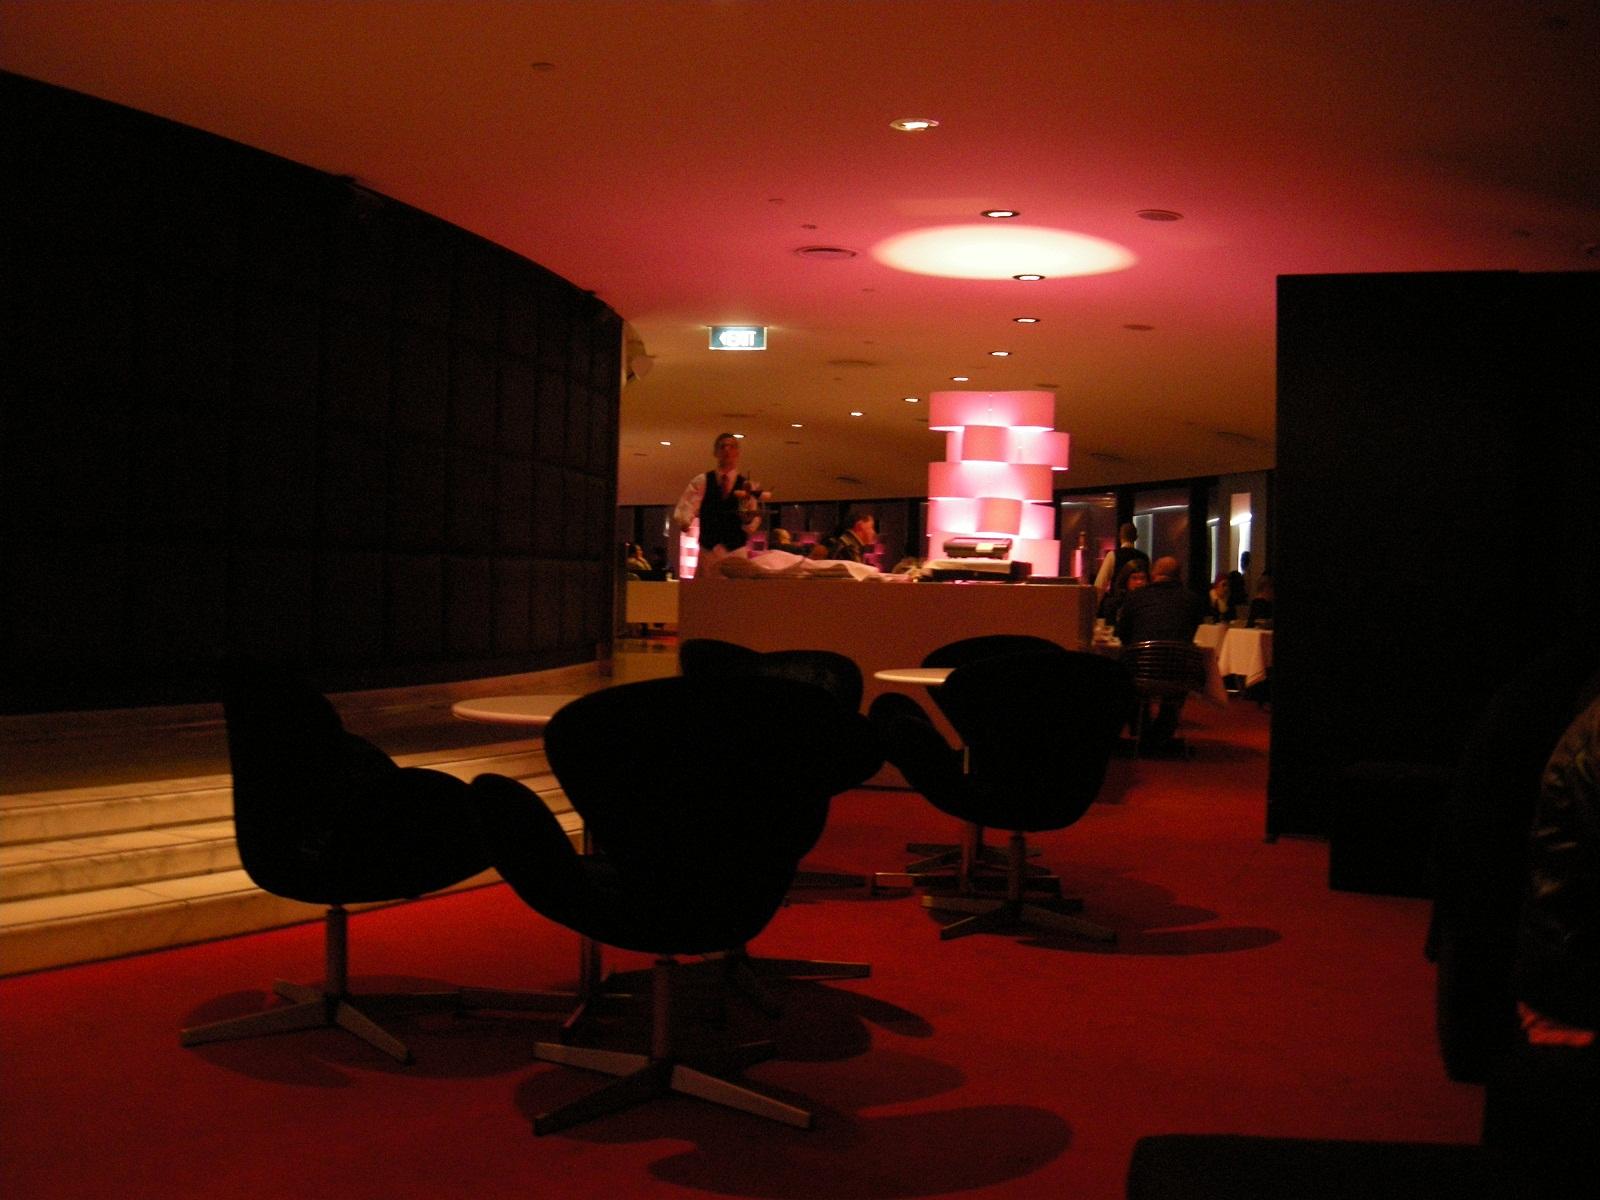 Top rotating restaurants summit restaurant sydney for Australian cuisine restaurants sydney